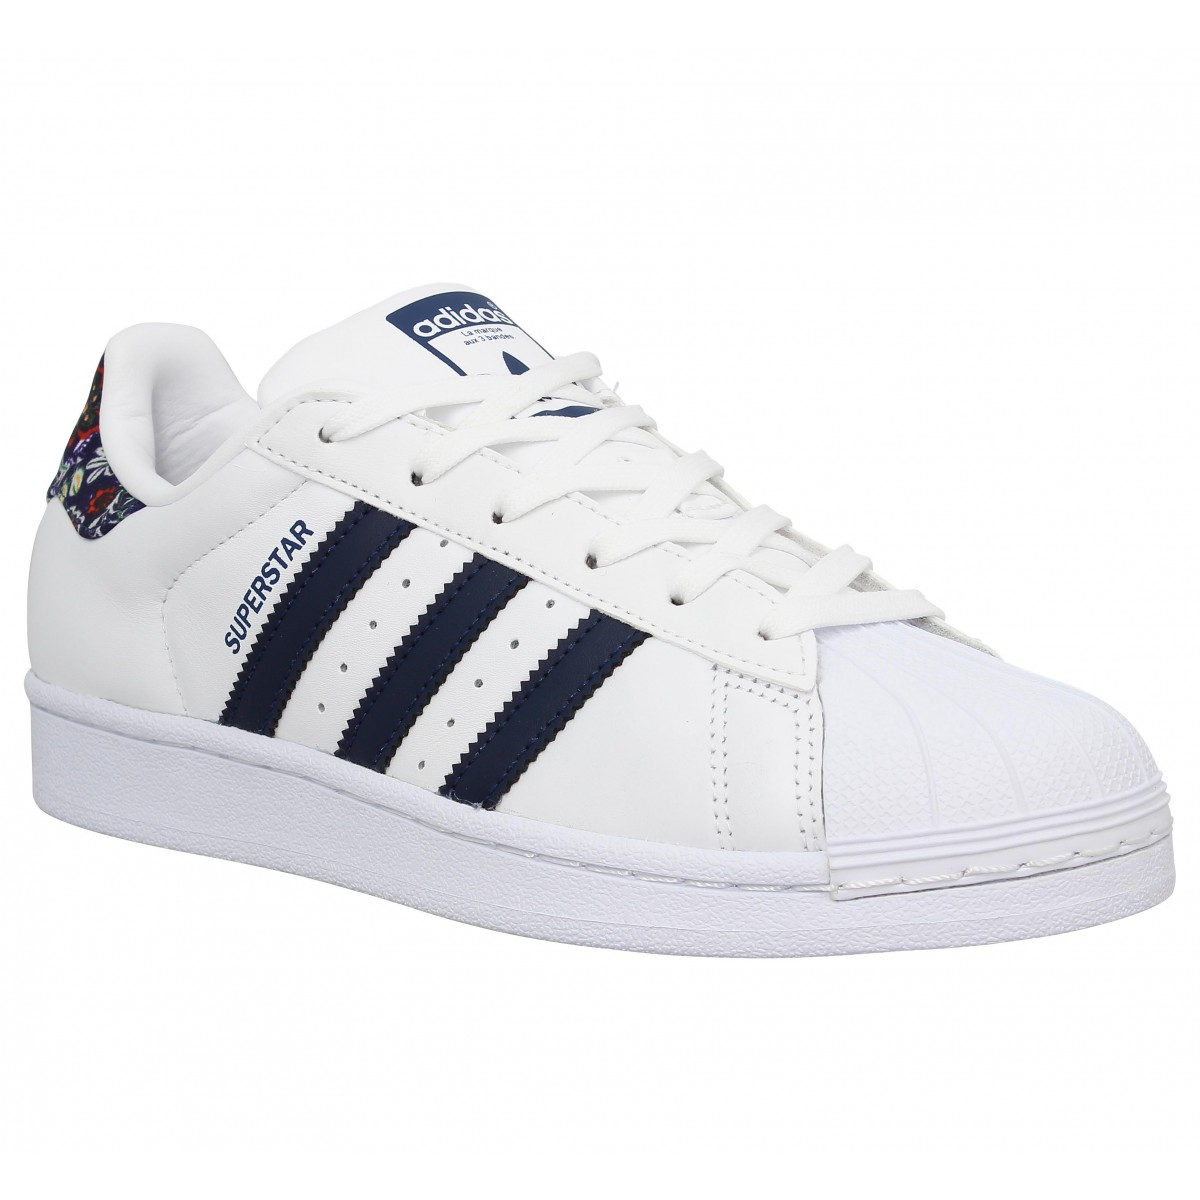 Adidas Femme Superstar-38-blanc Marine